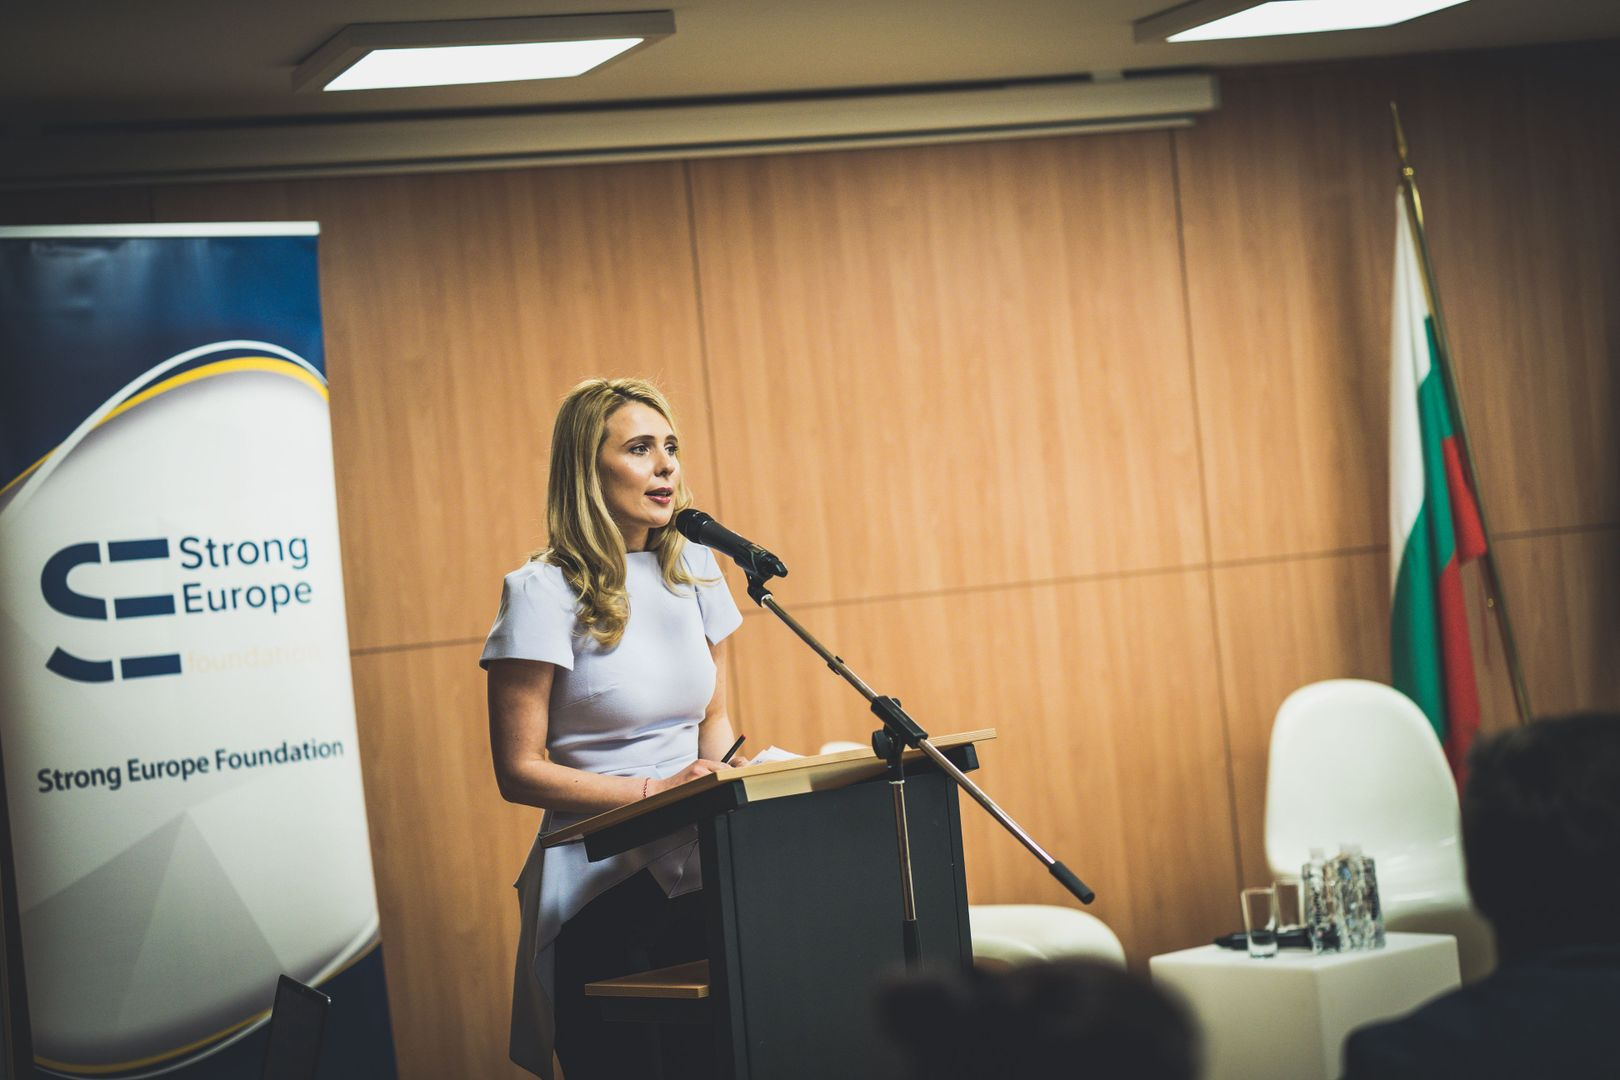 conservative-millenium-strongeurope-event-april-14